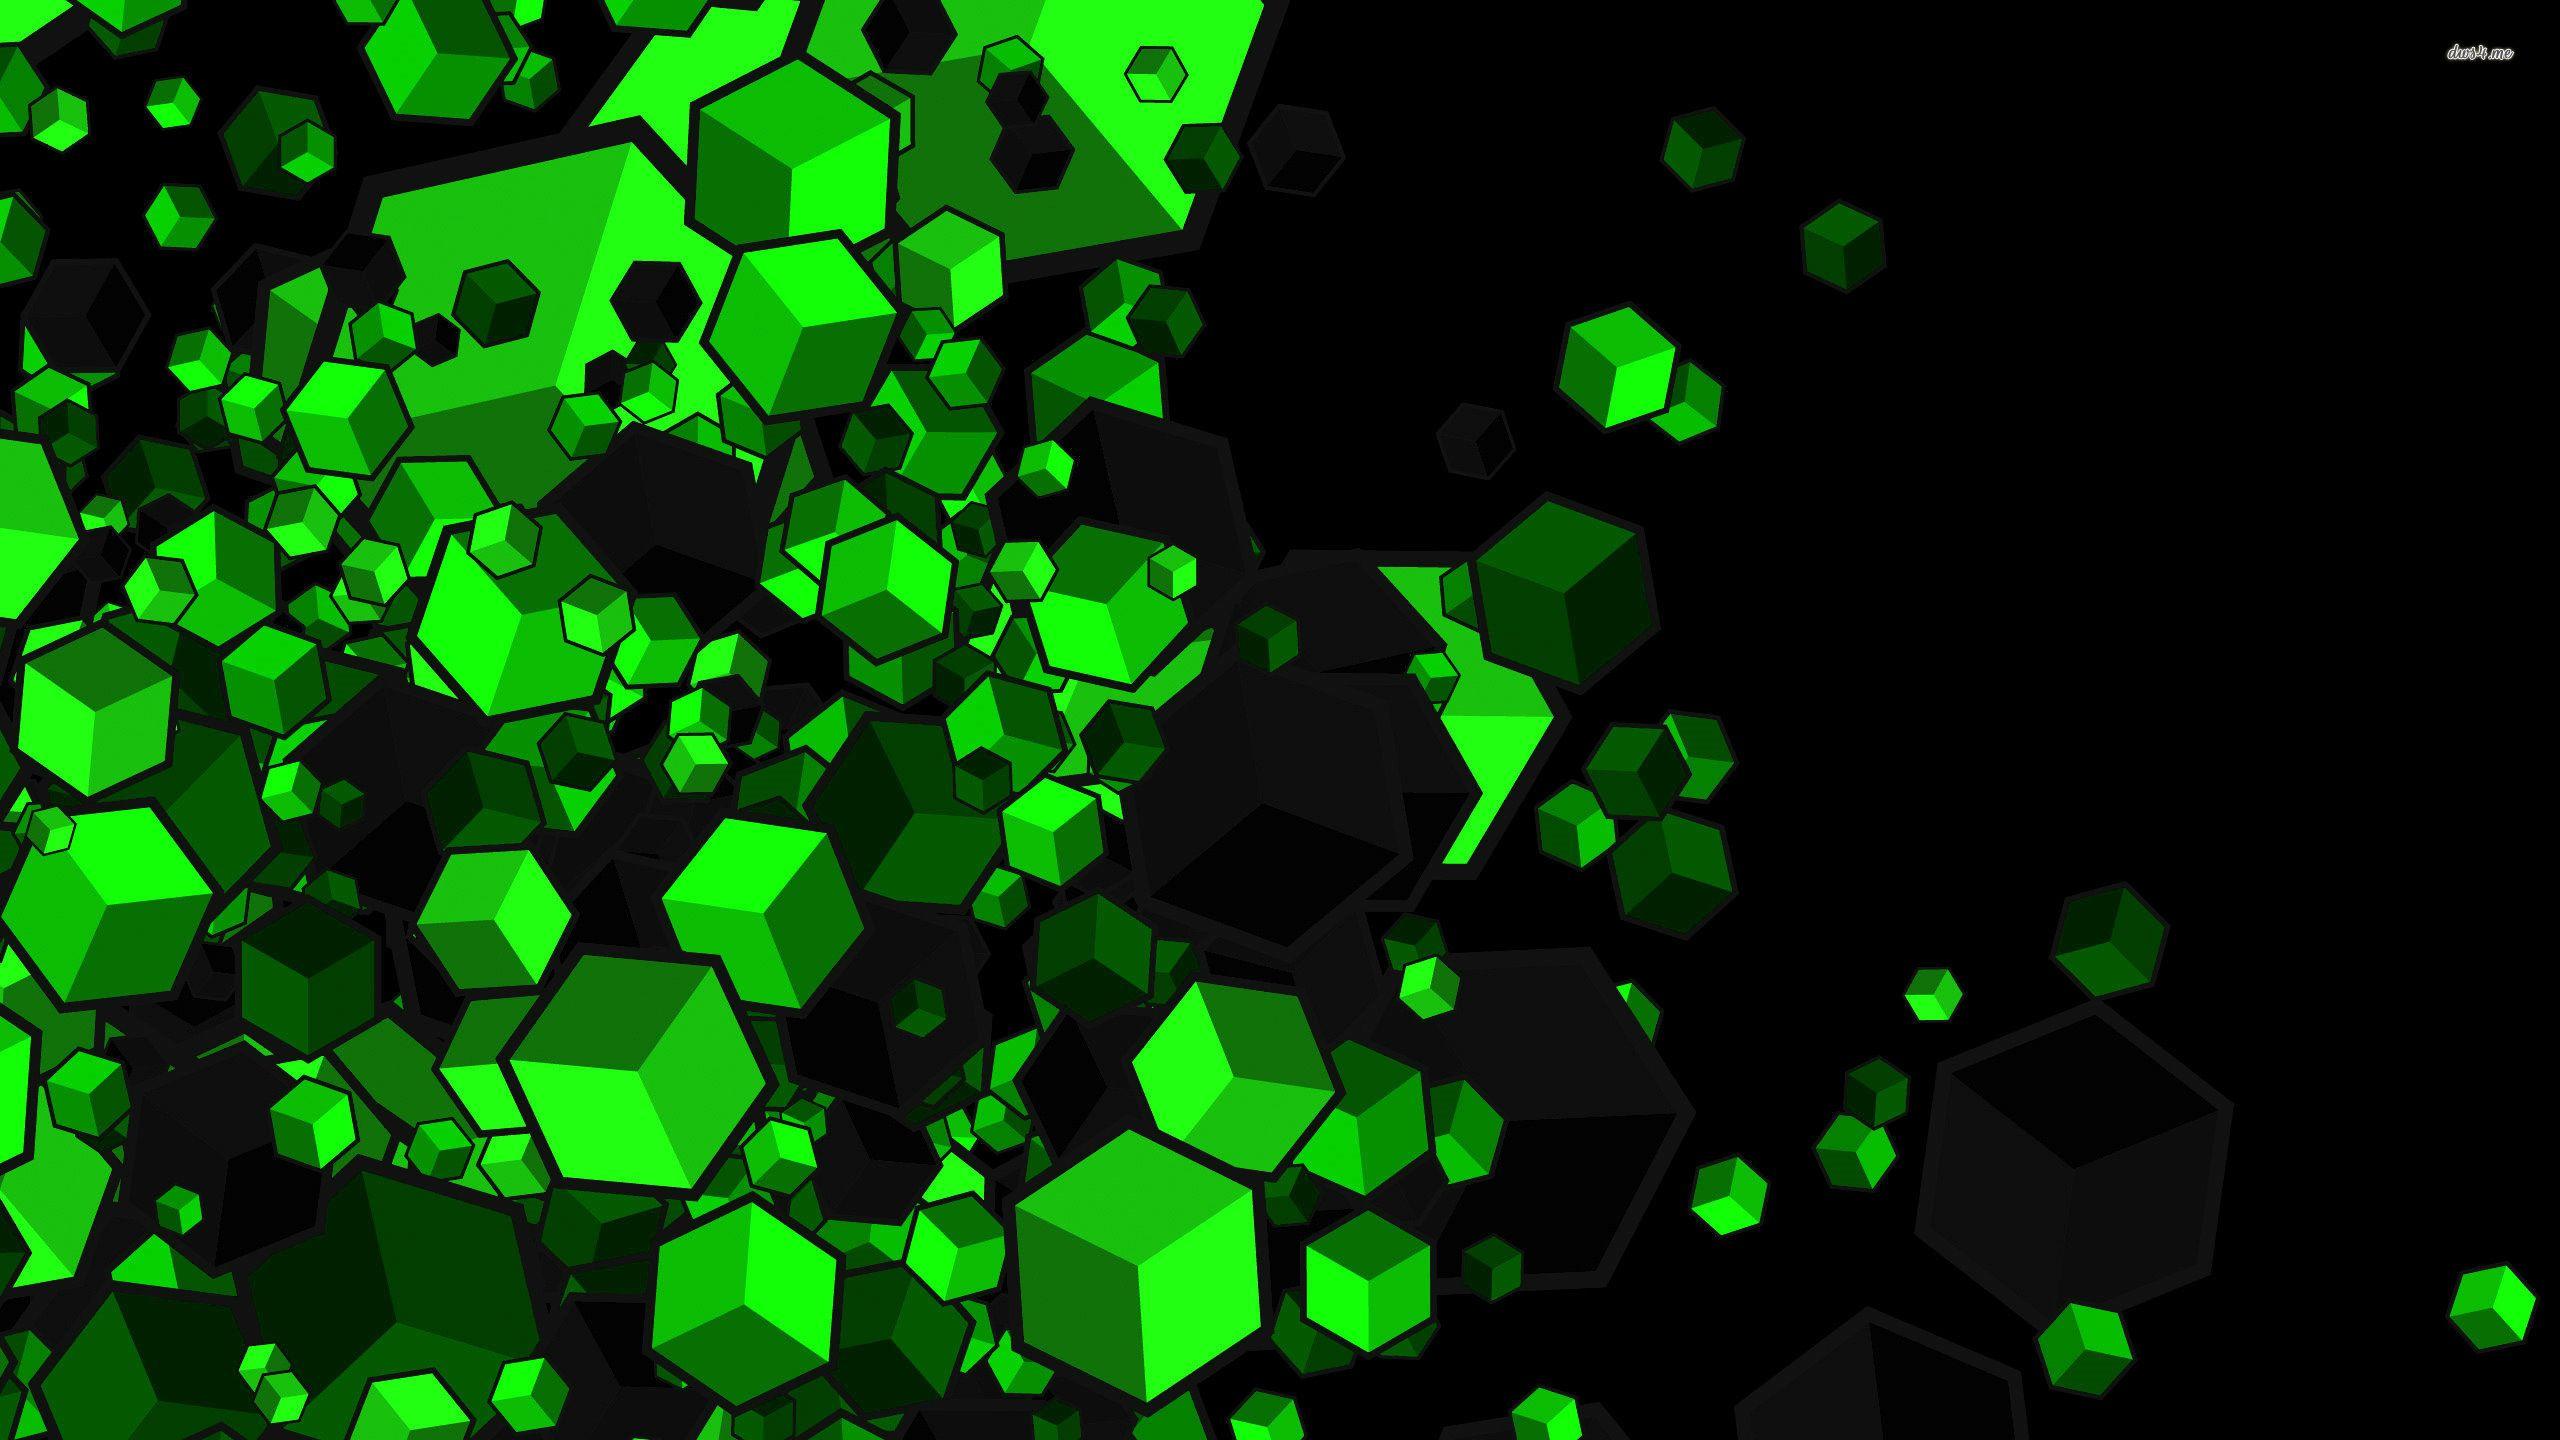 Black And Green Desktop Wallpapers Wallpapersafari Background Hd Wallpaper Abstract Wallpaper Green Wallpaper